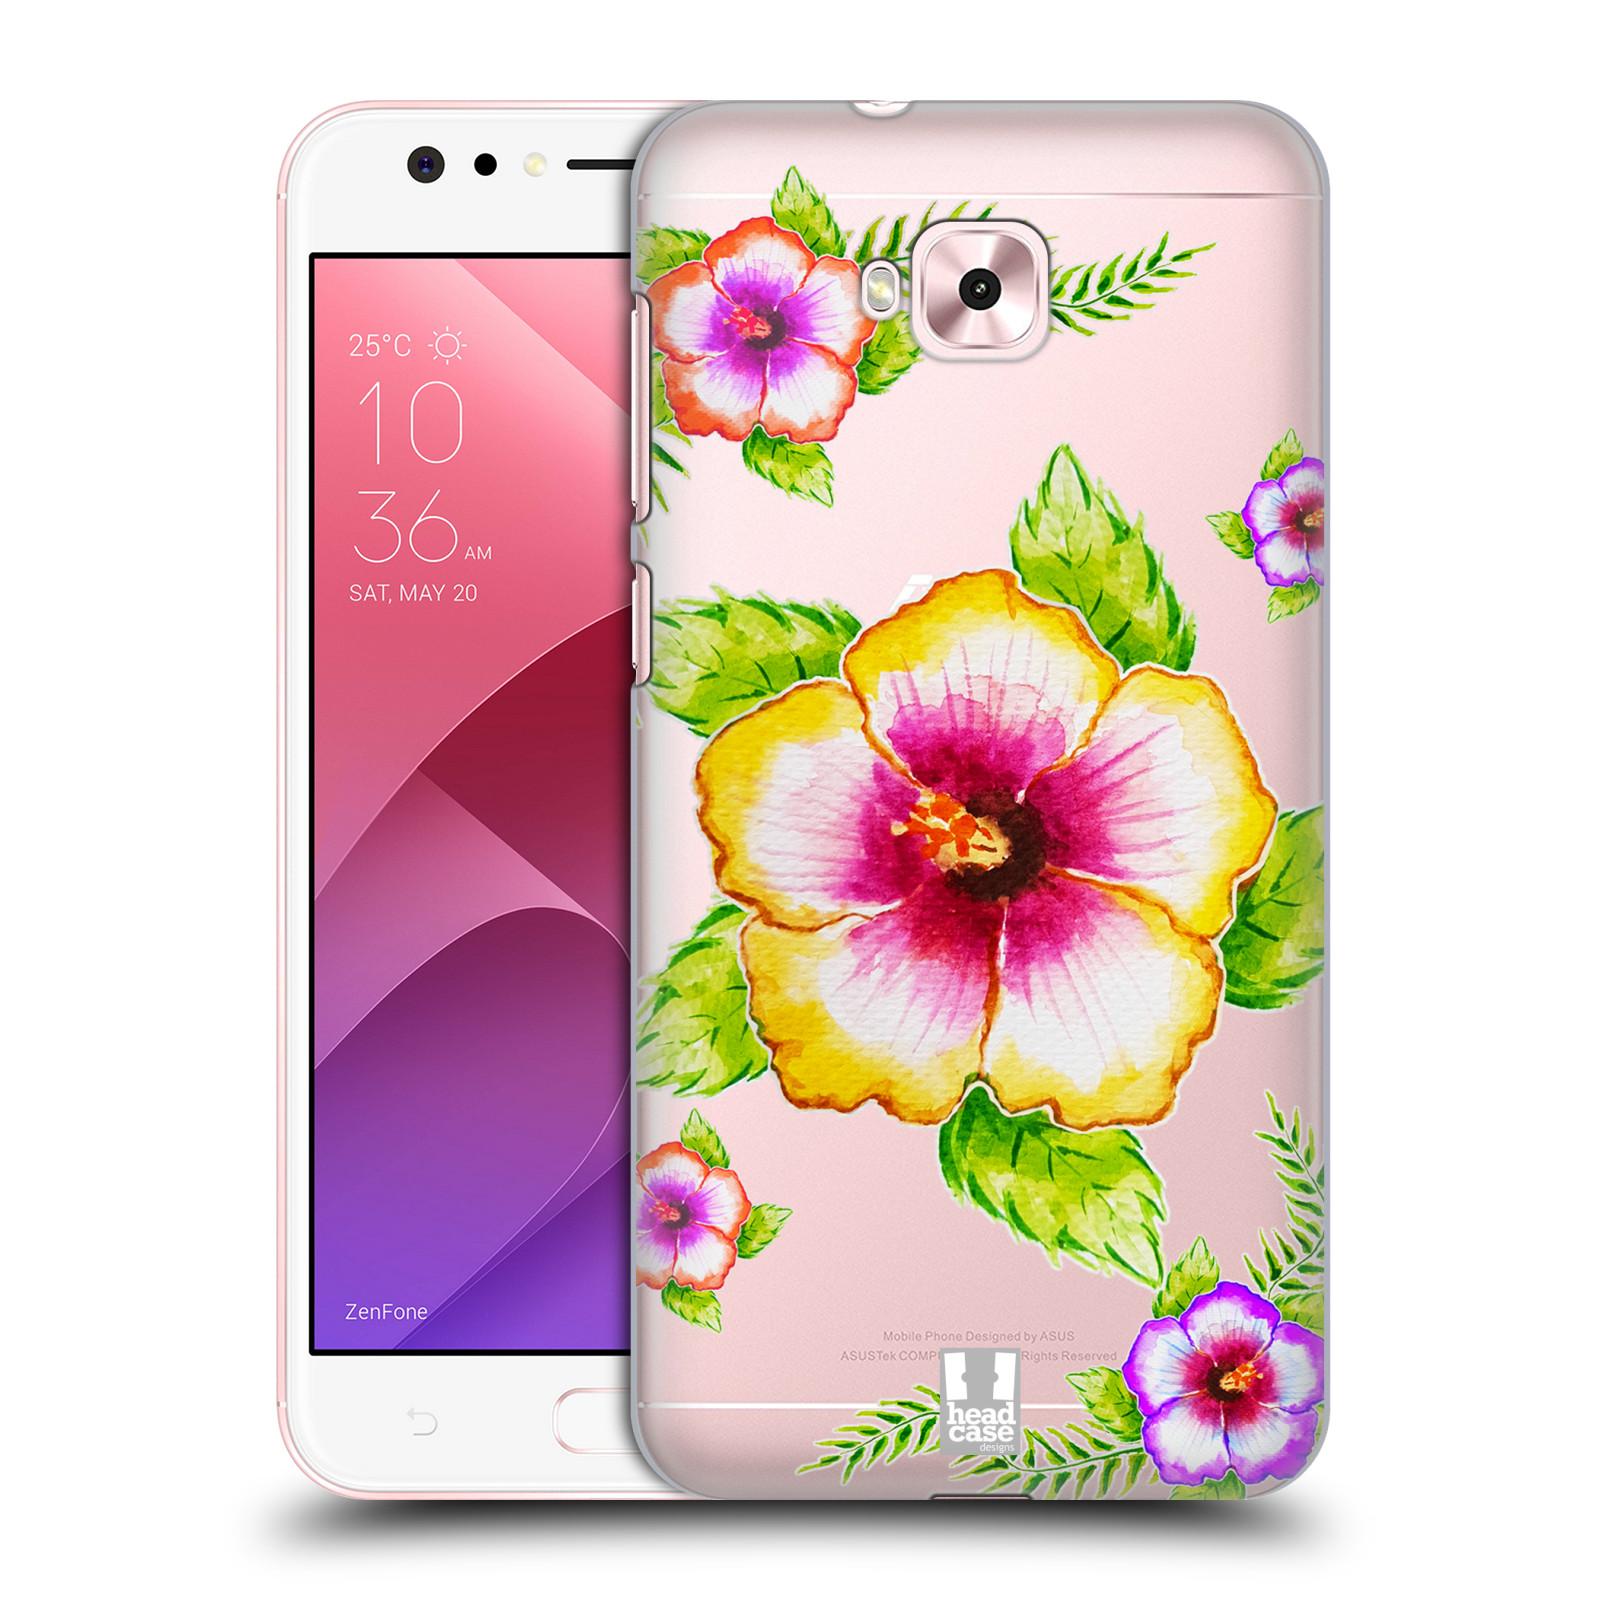 HEAD CASE plastový obal na mobil Asus Zenfone 4 Selfie ZD553KL Květina Ibišek vodní barvy